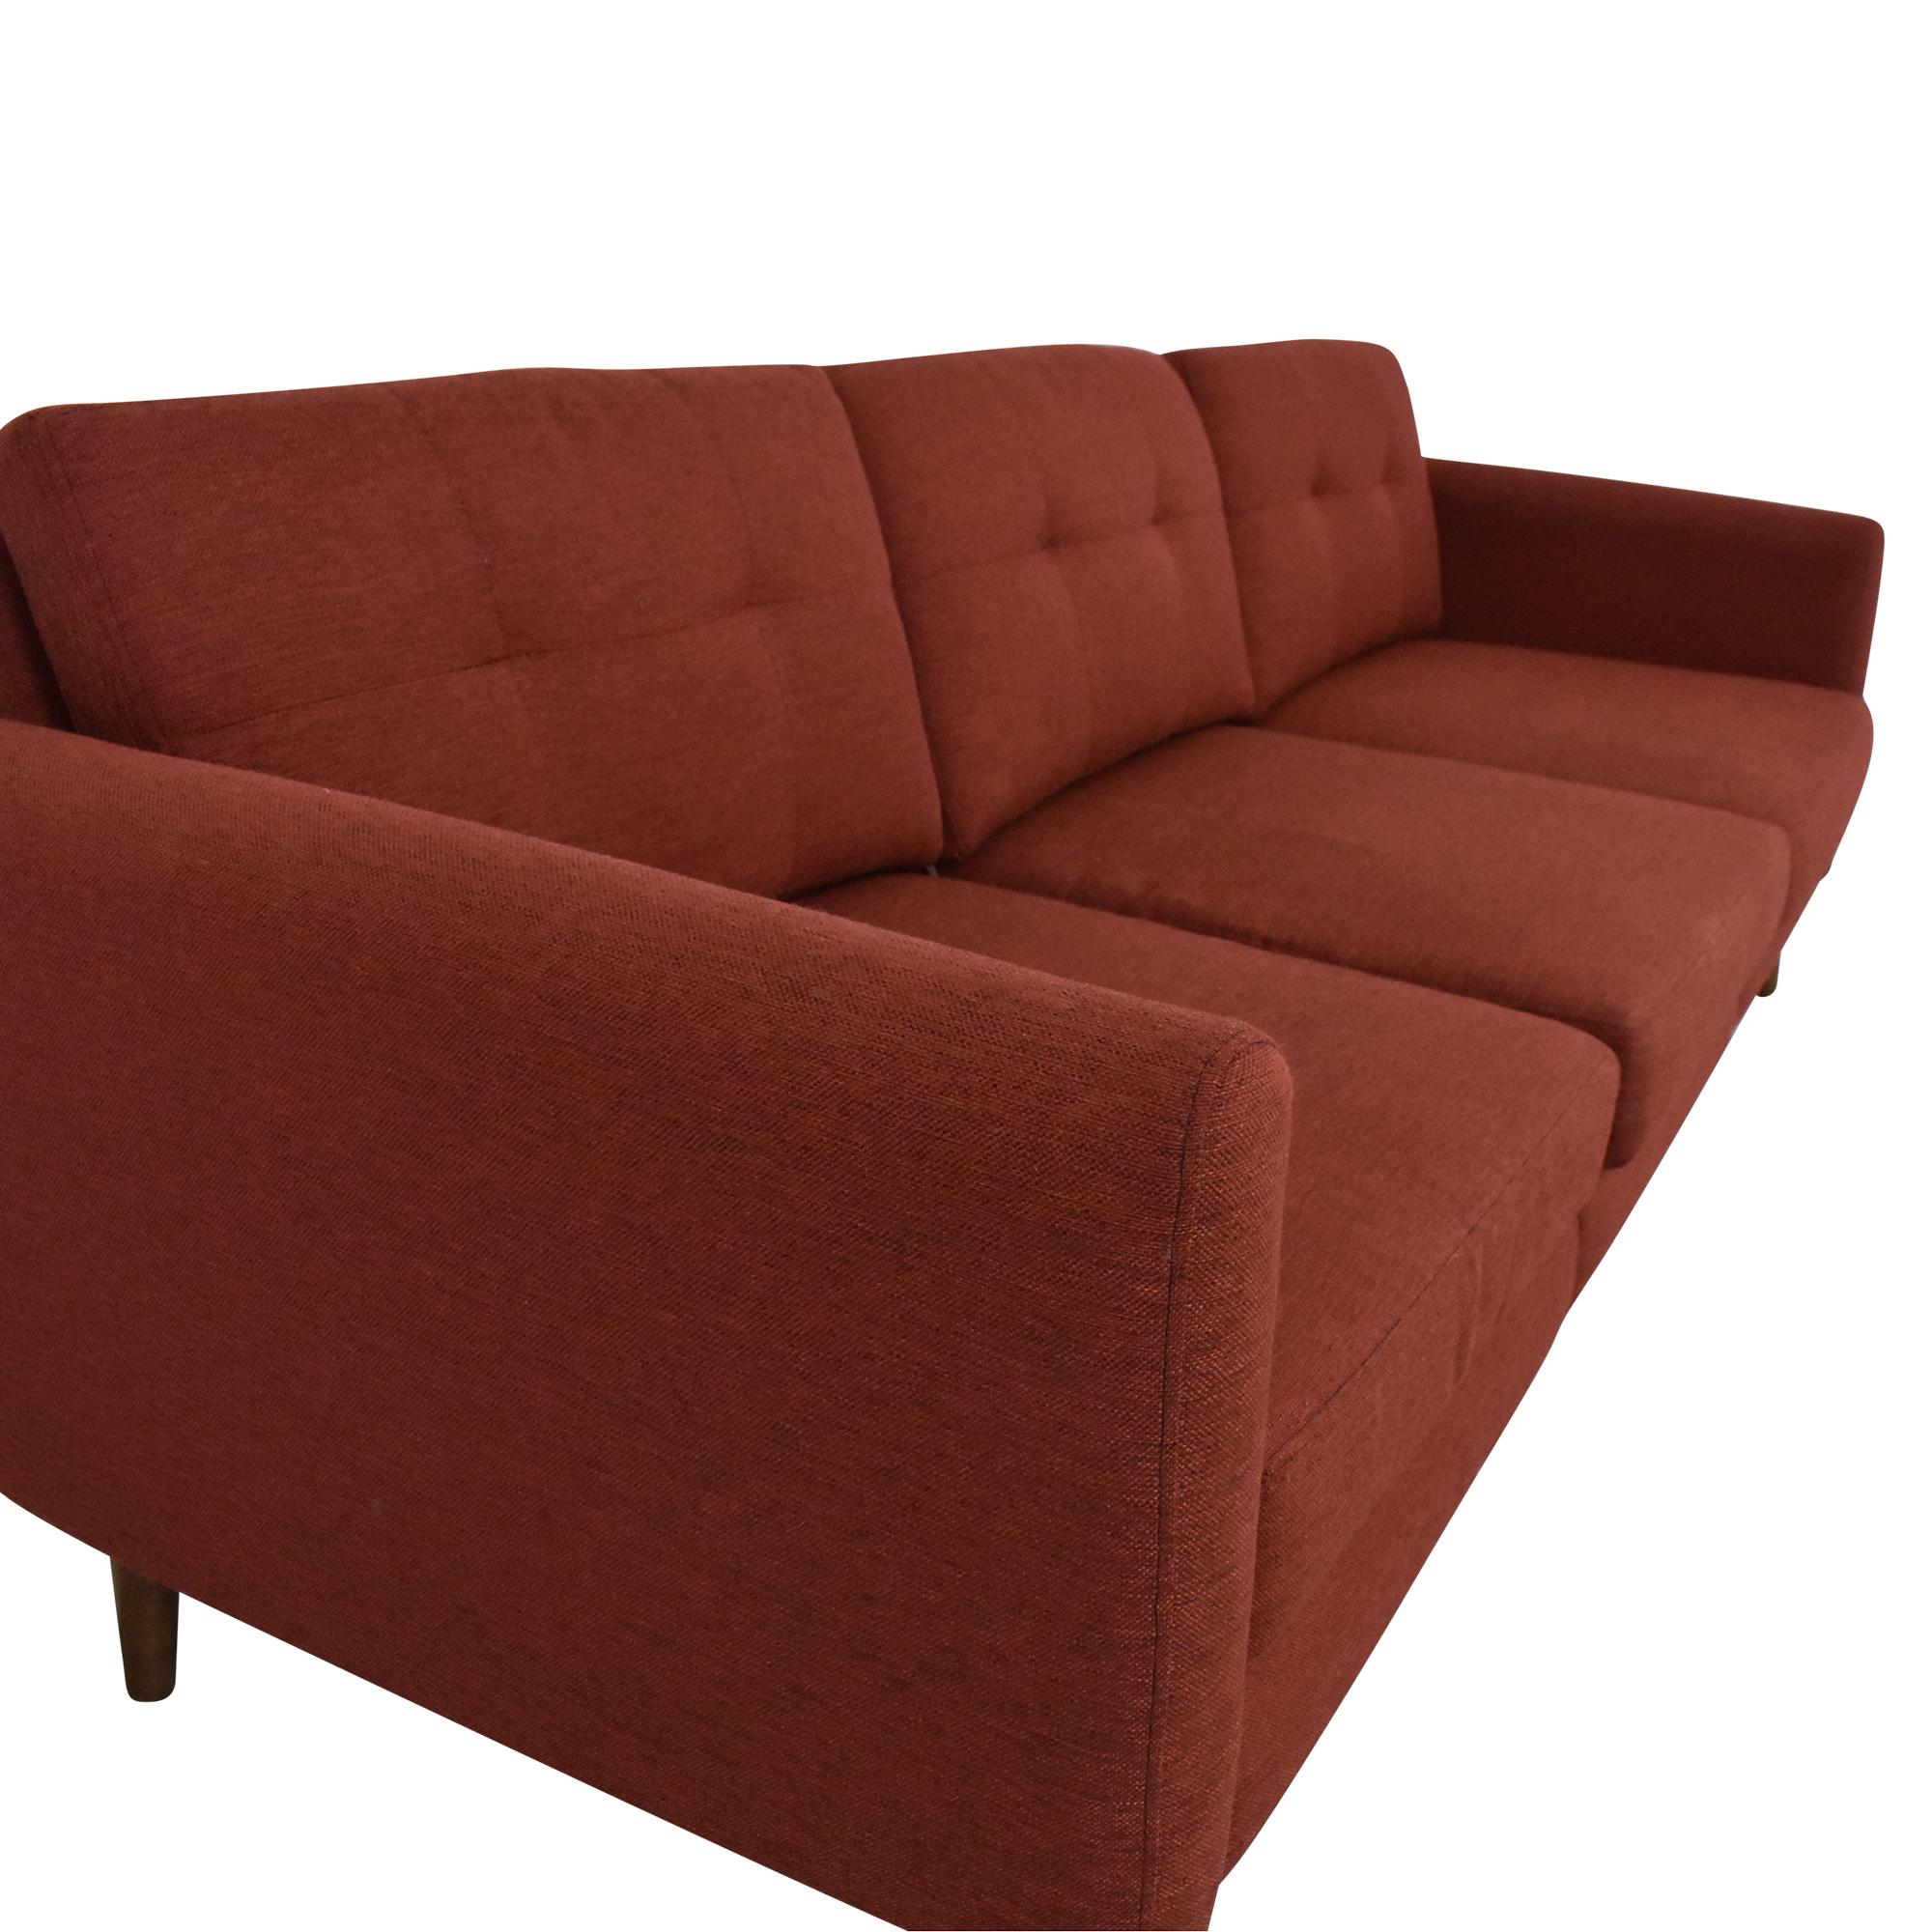 Burrow Burrow Block Nomad Sofa with Ottoman price